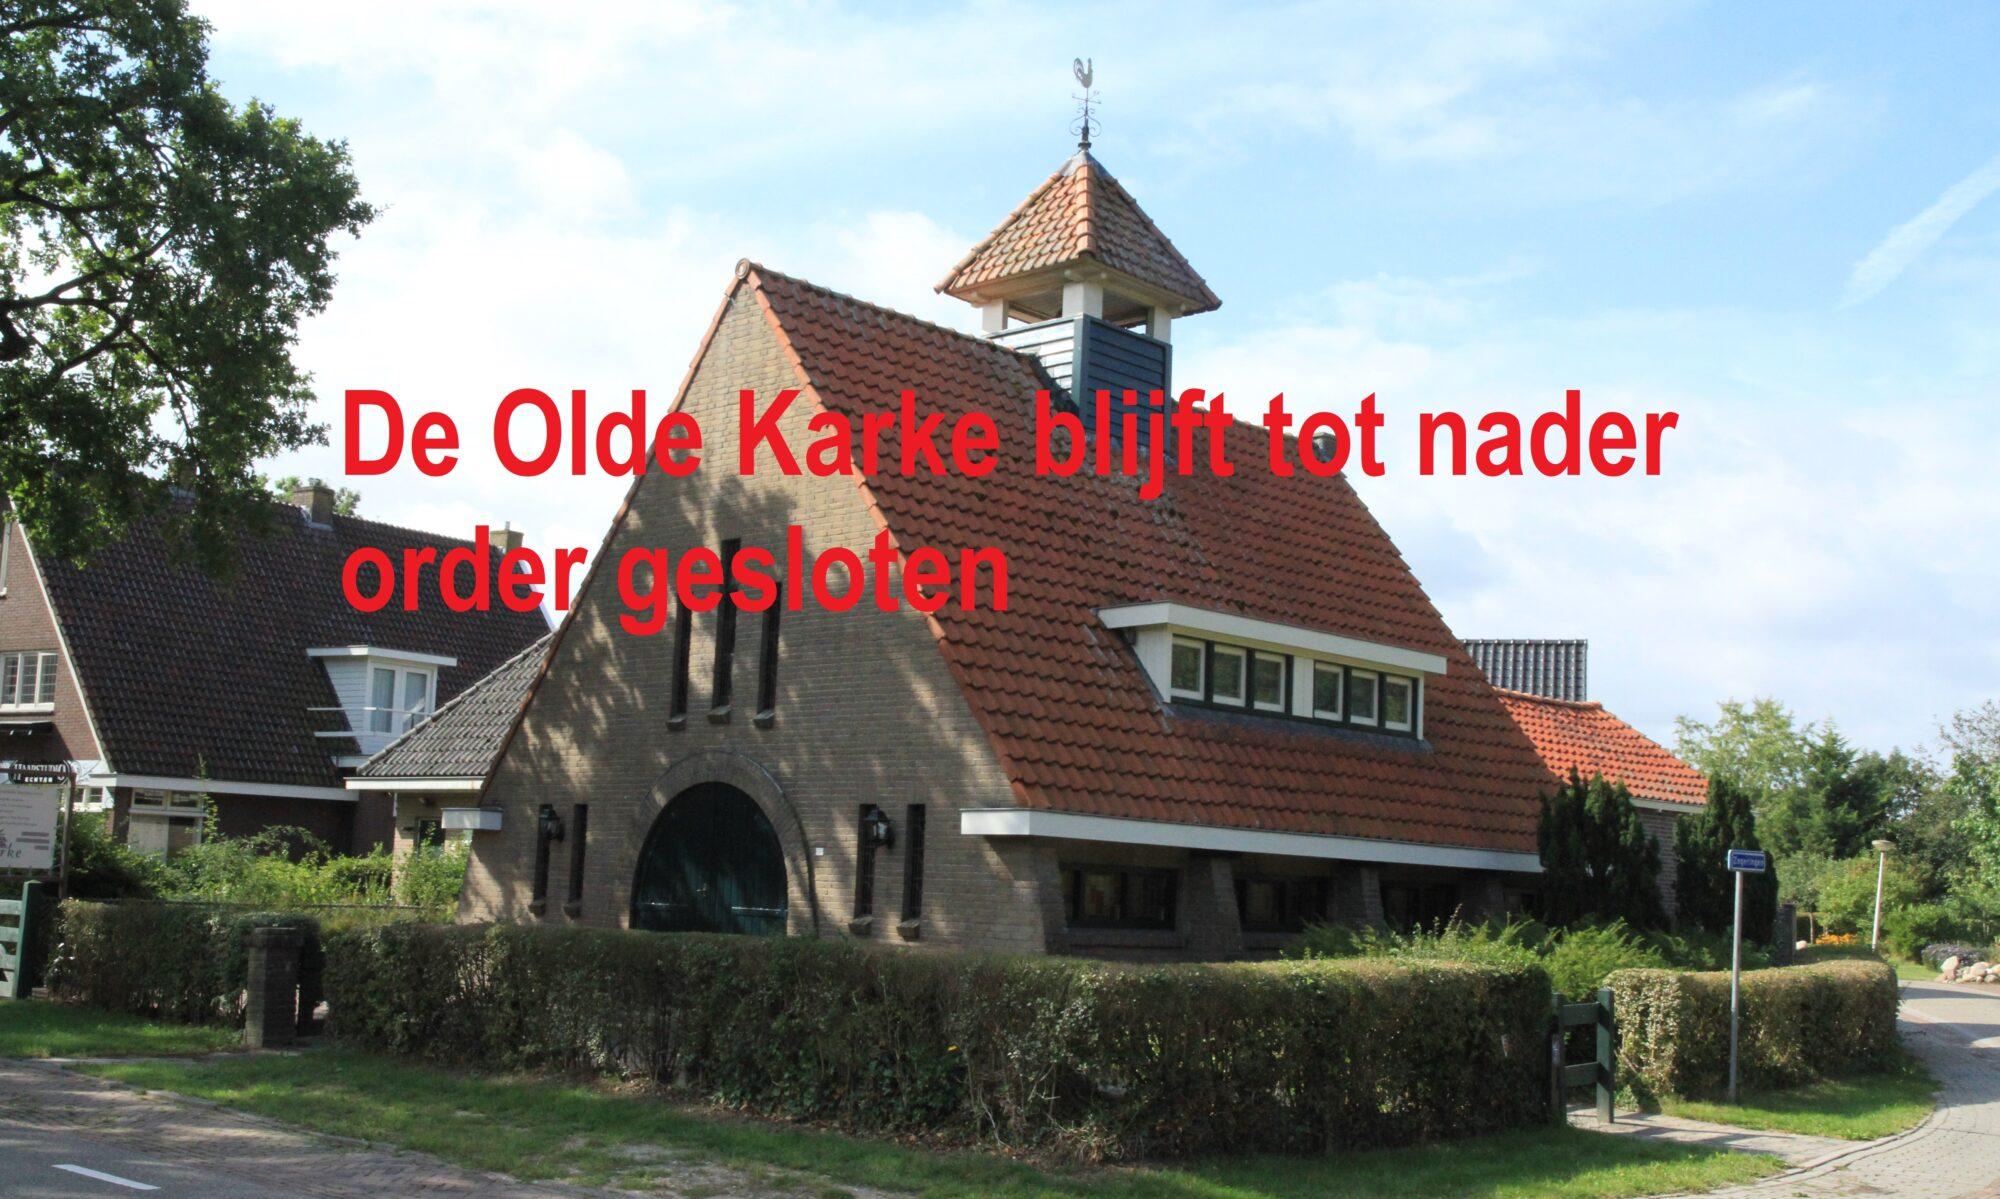 d' Olde Karke